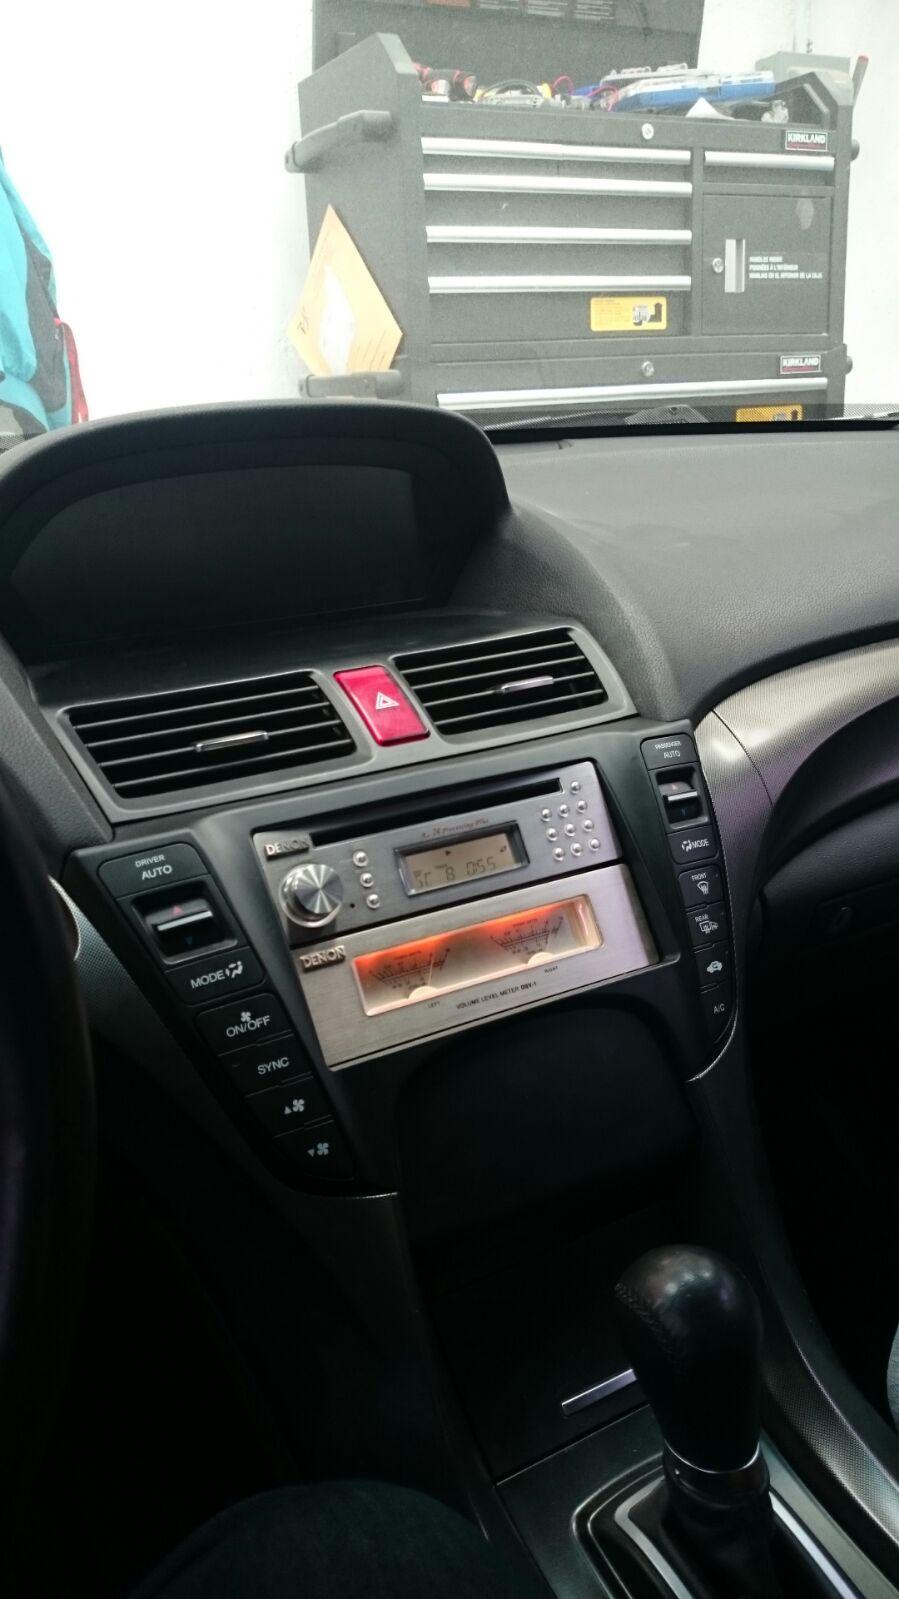 09 Acura Tl Aftermarket Radio 2002